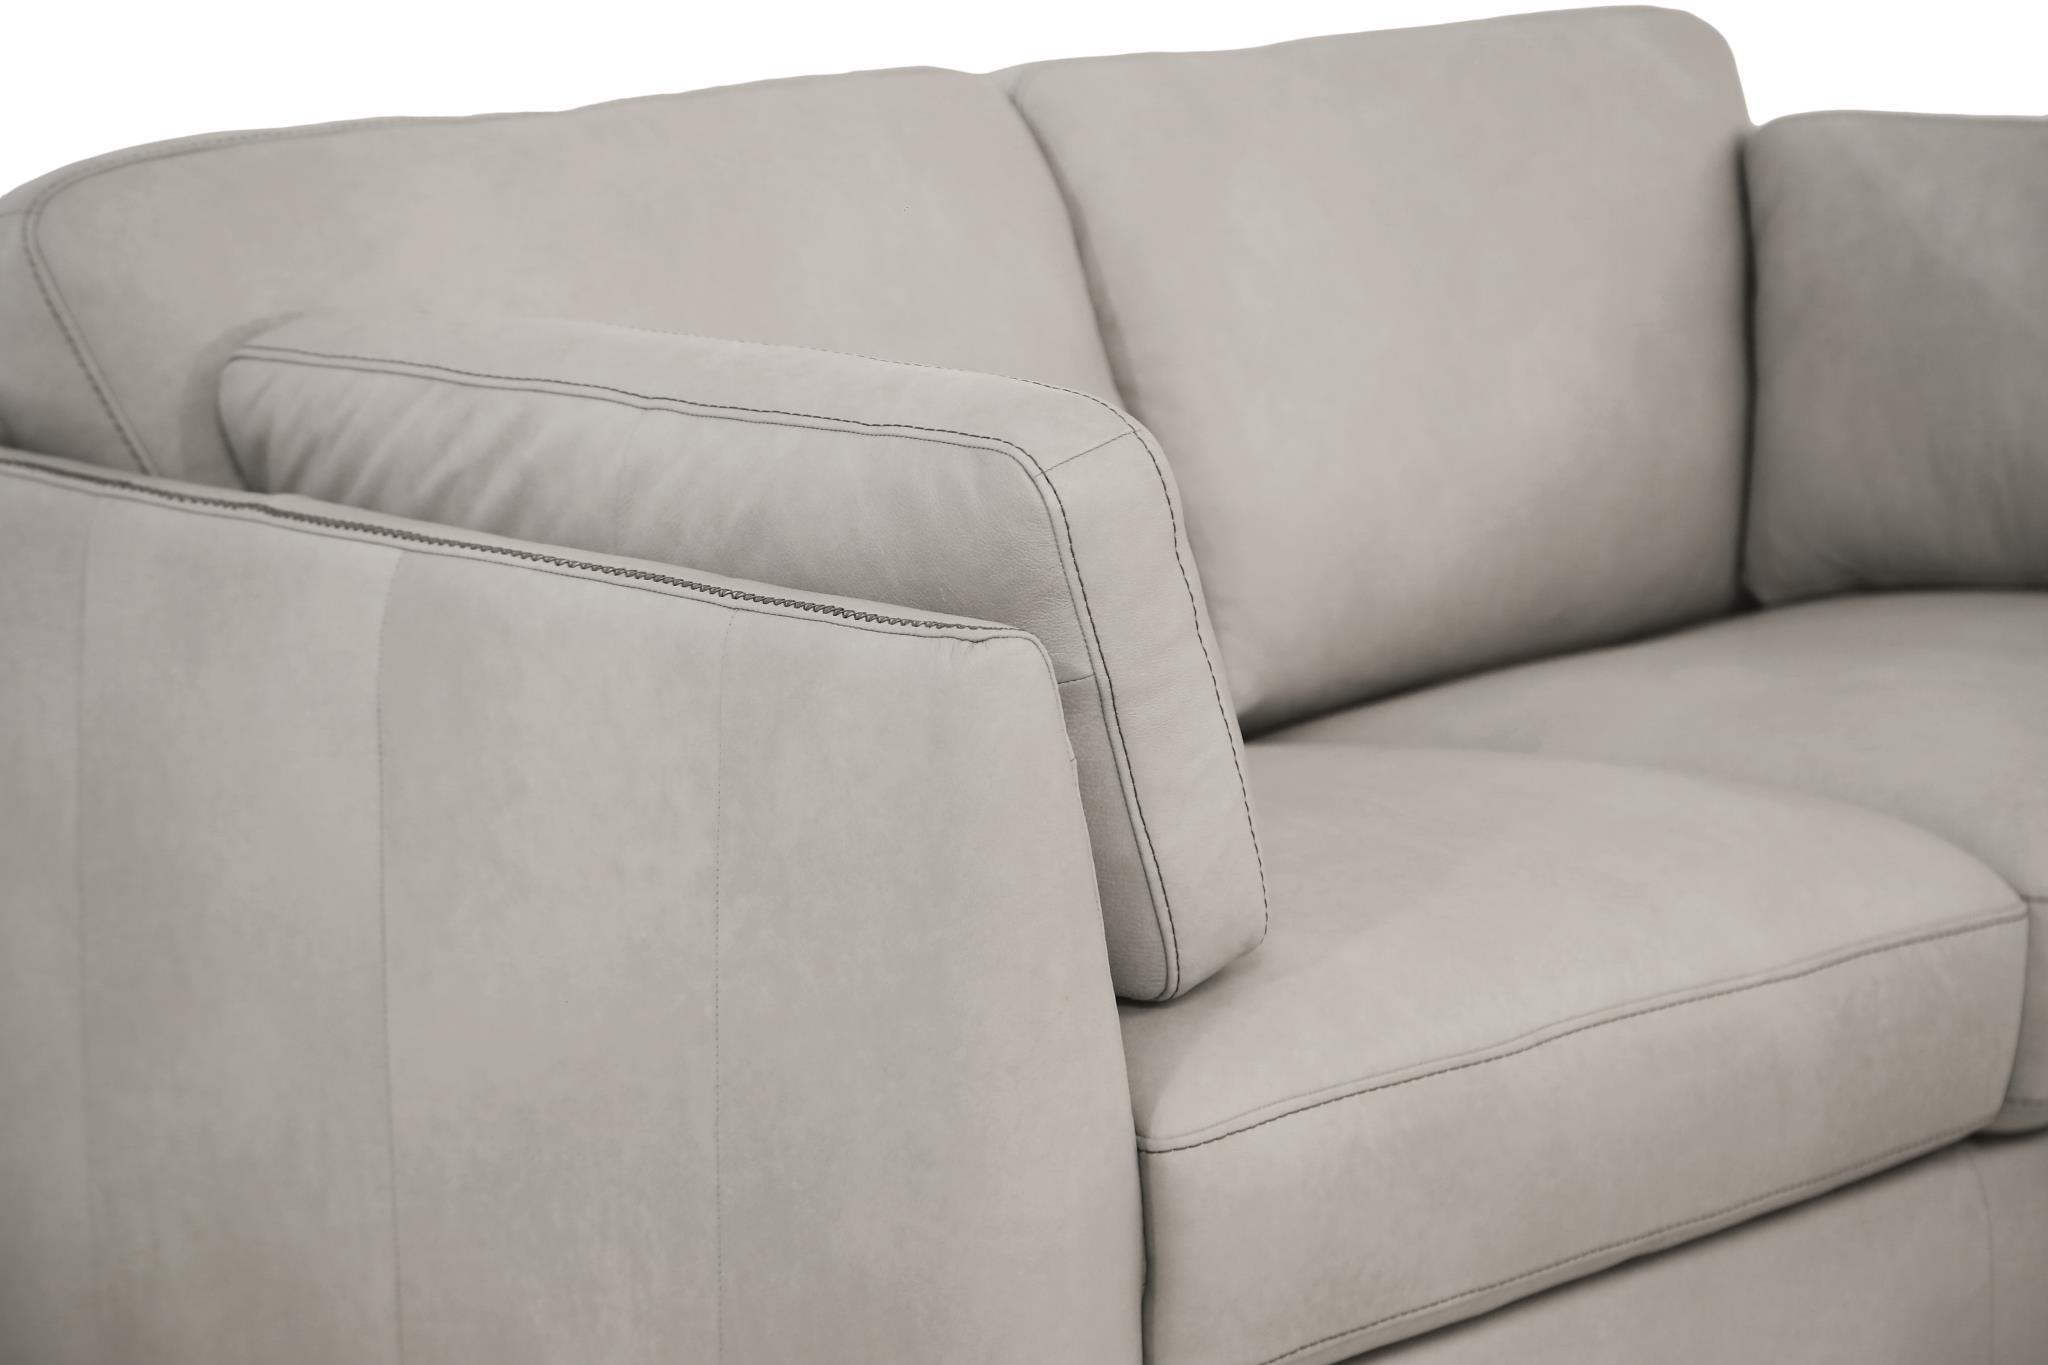 Dusty White Cushion Details